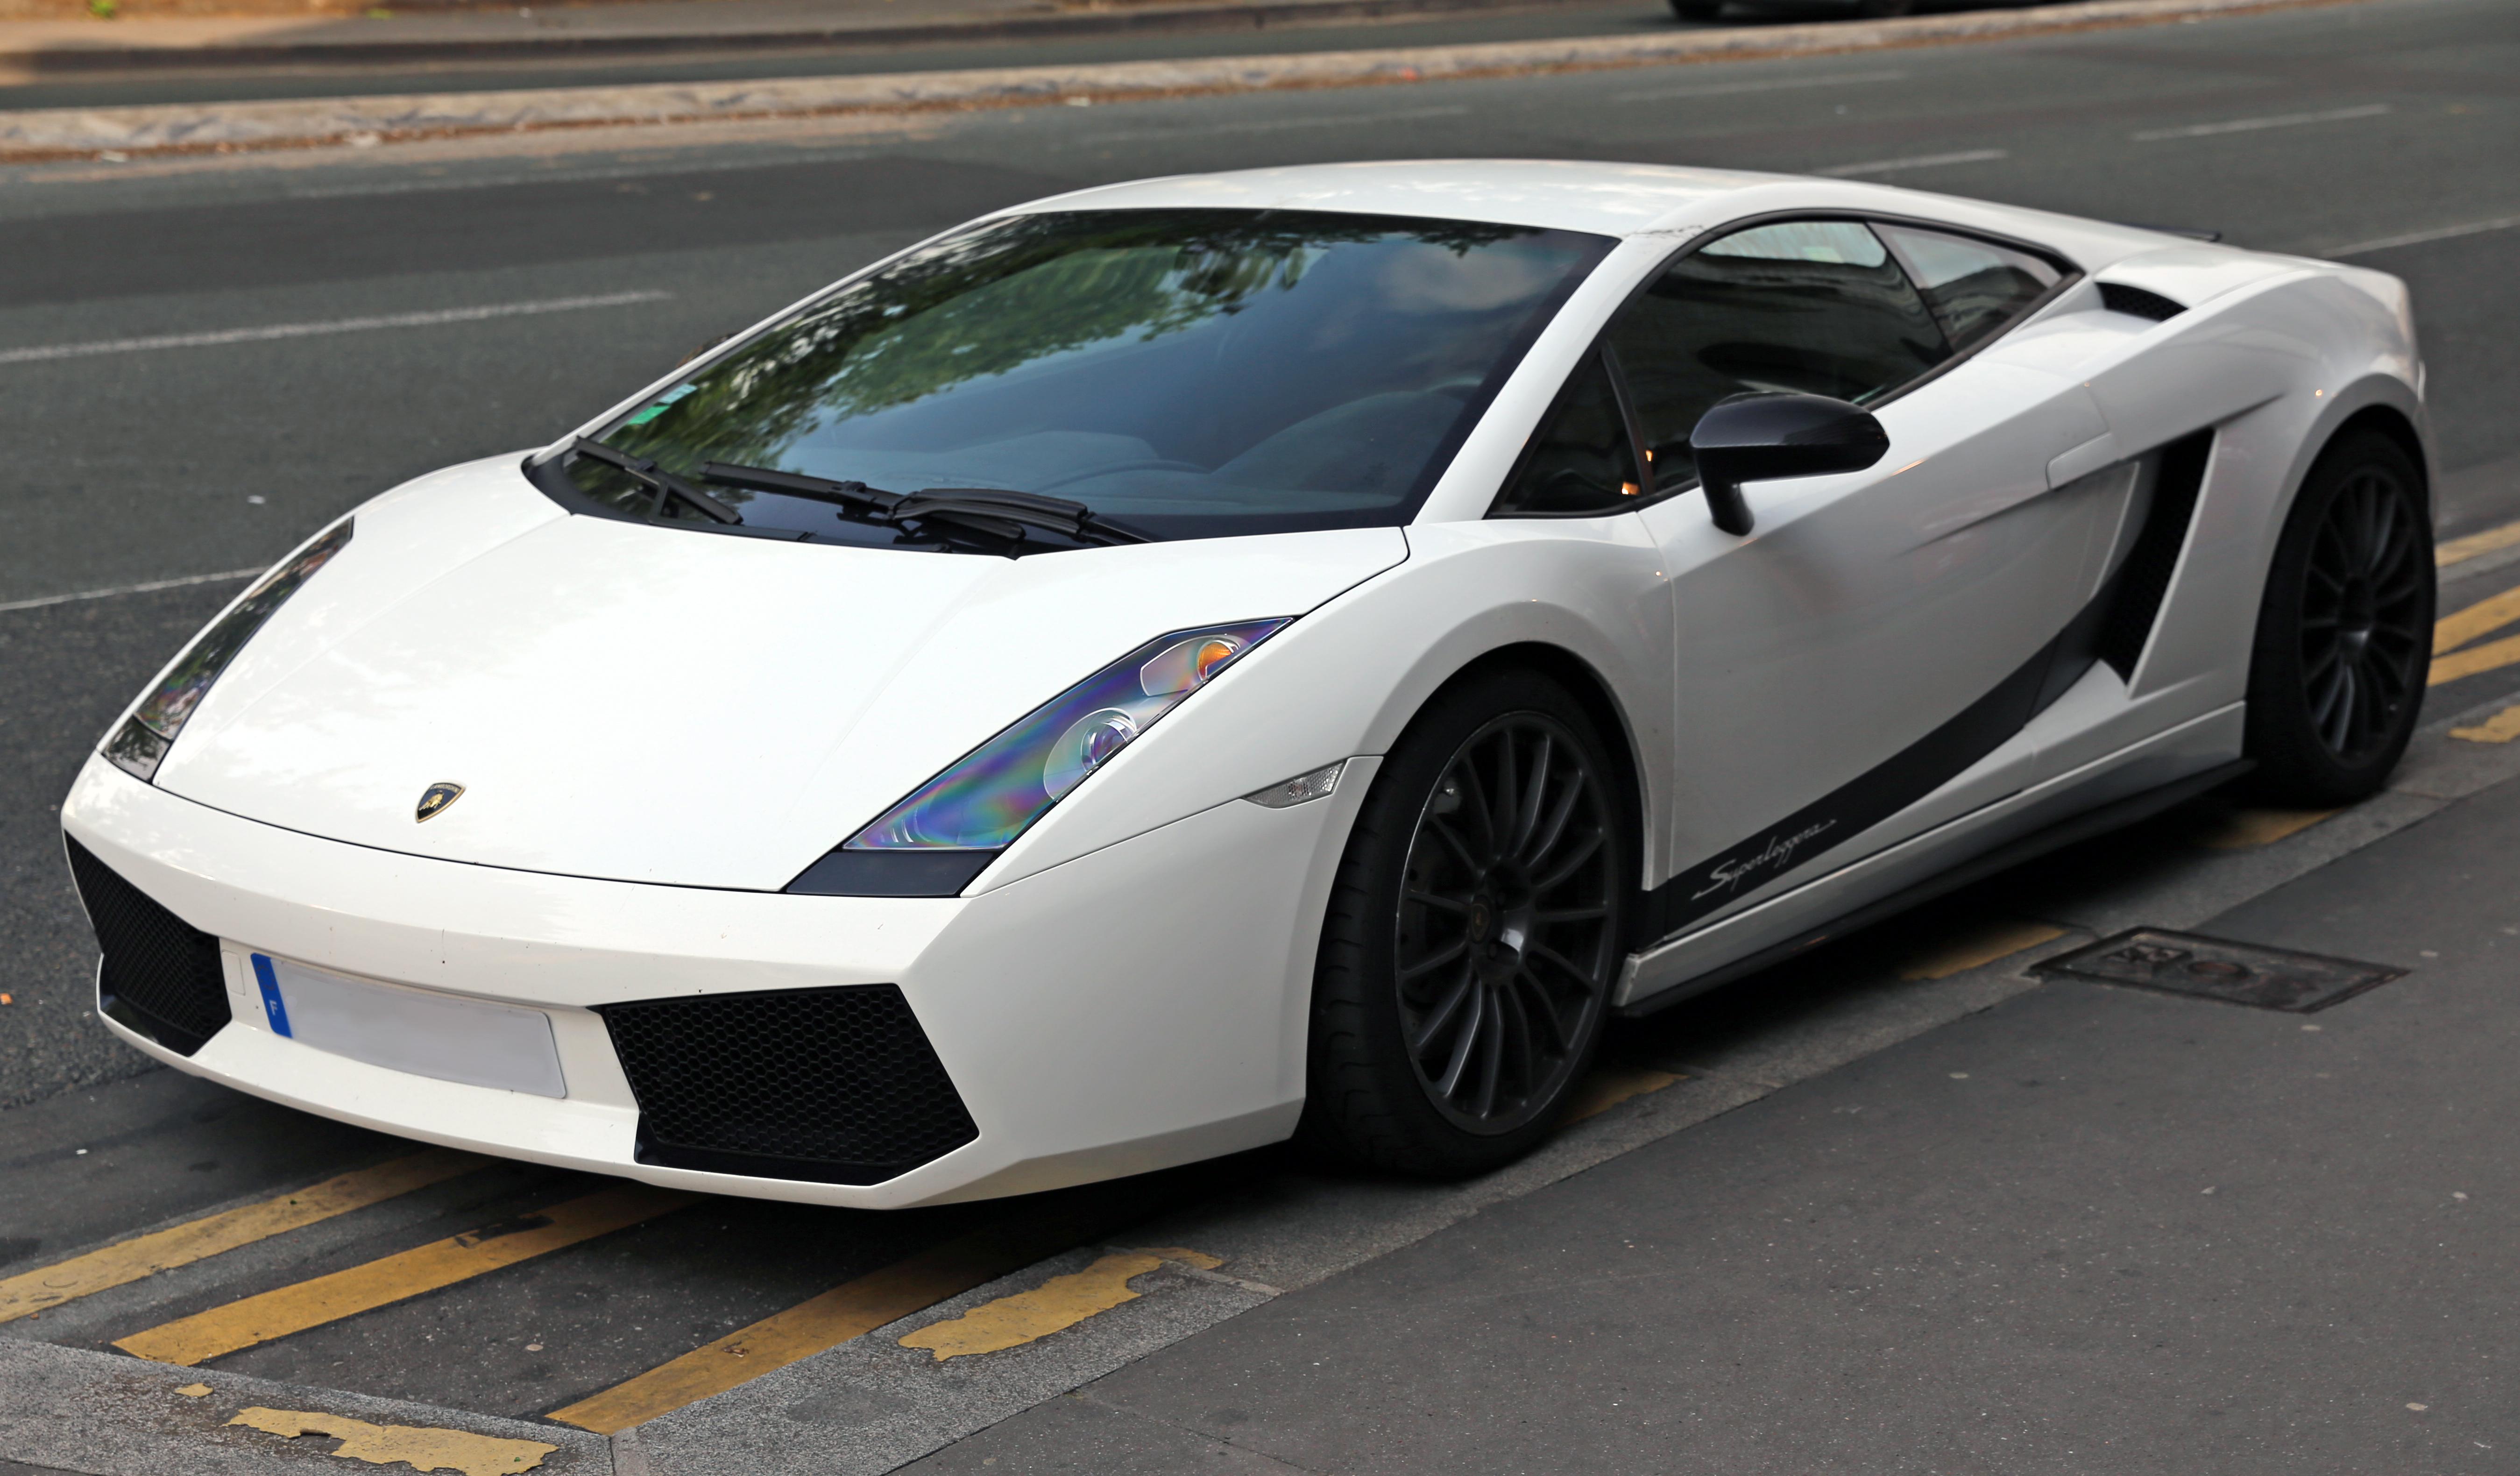 Lamborghini Gallardo High Quality Background on Wallpapers Vista